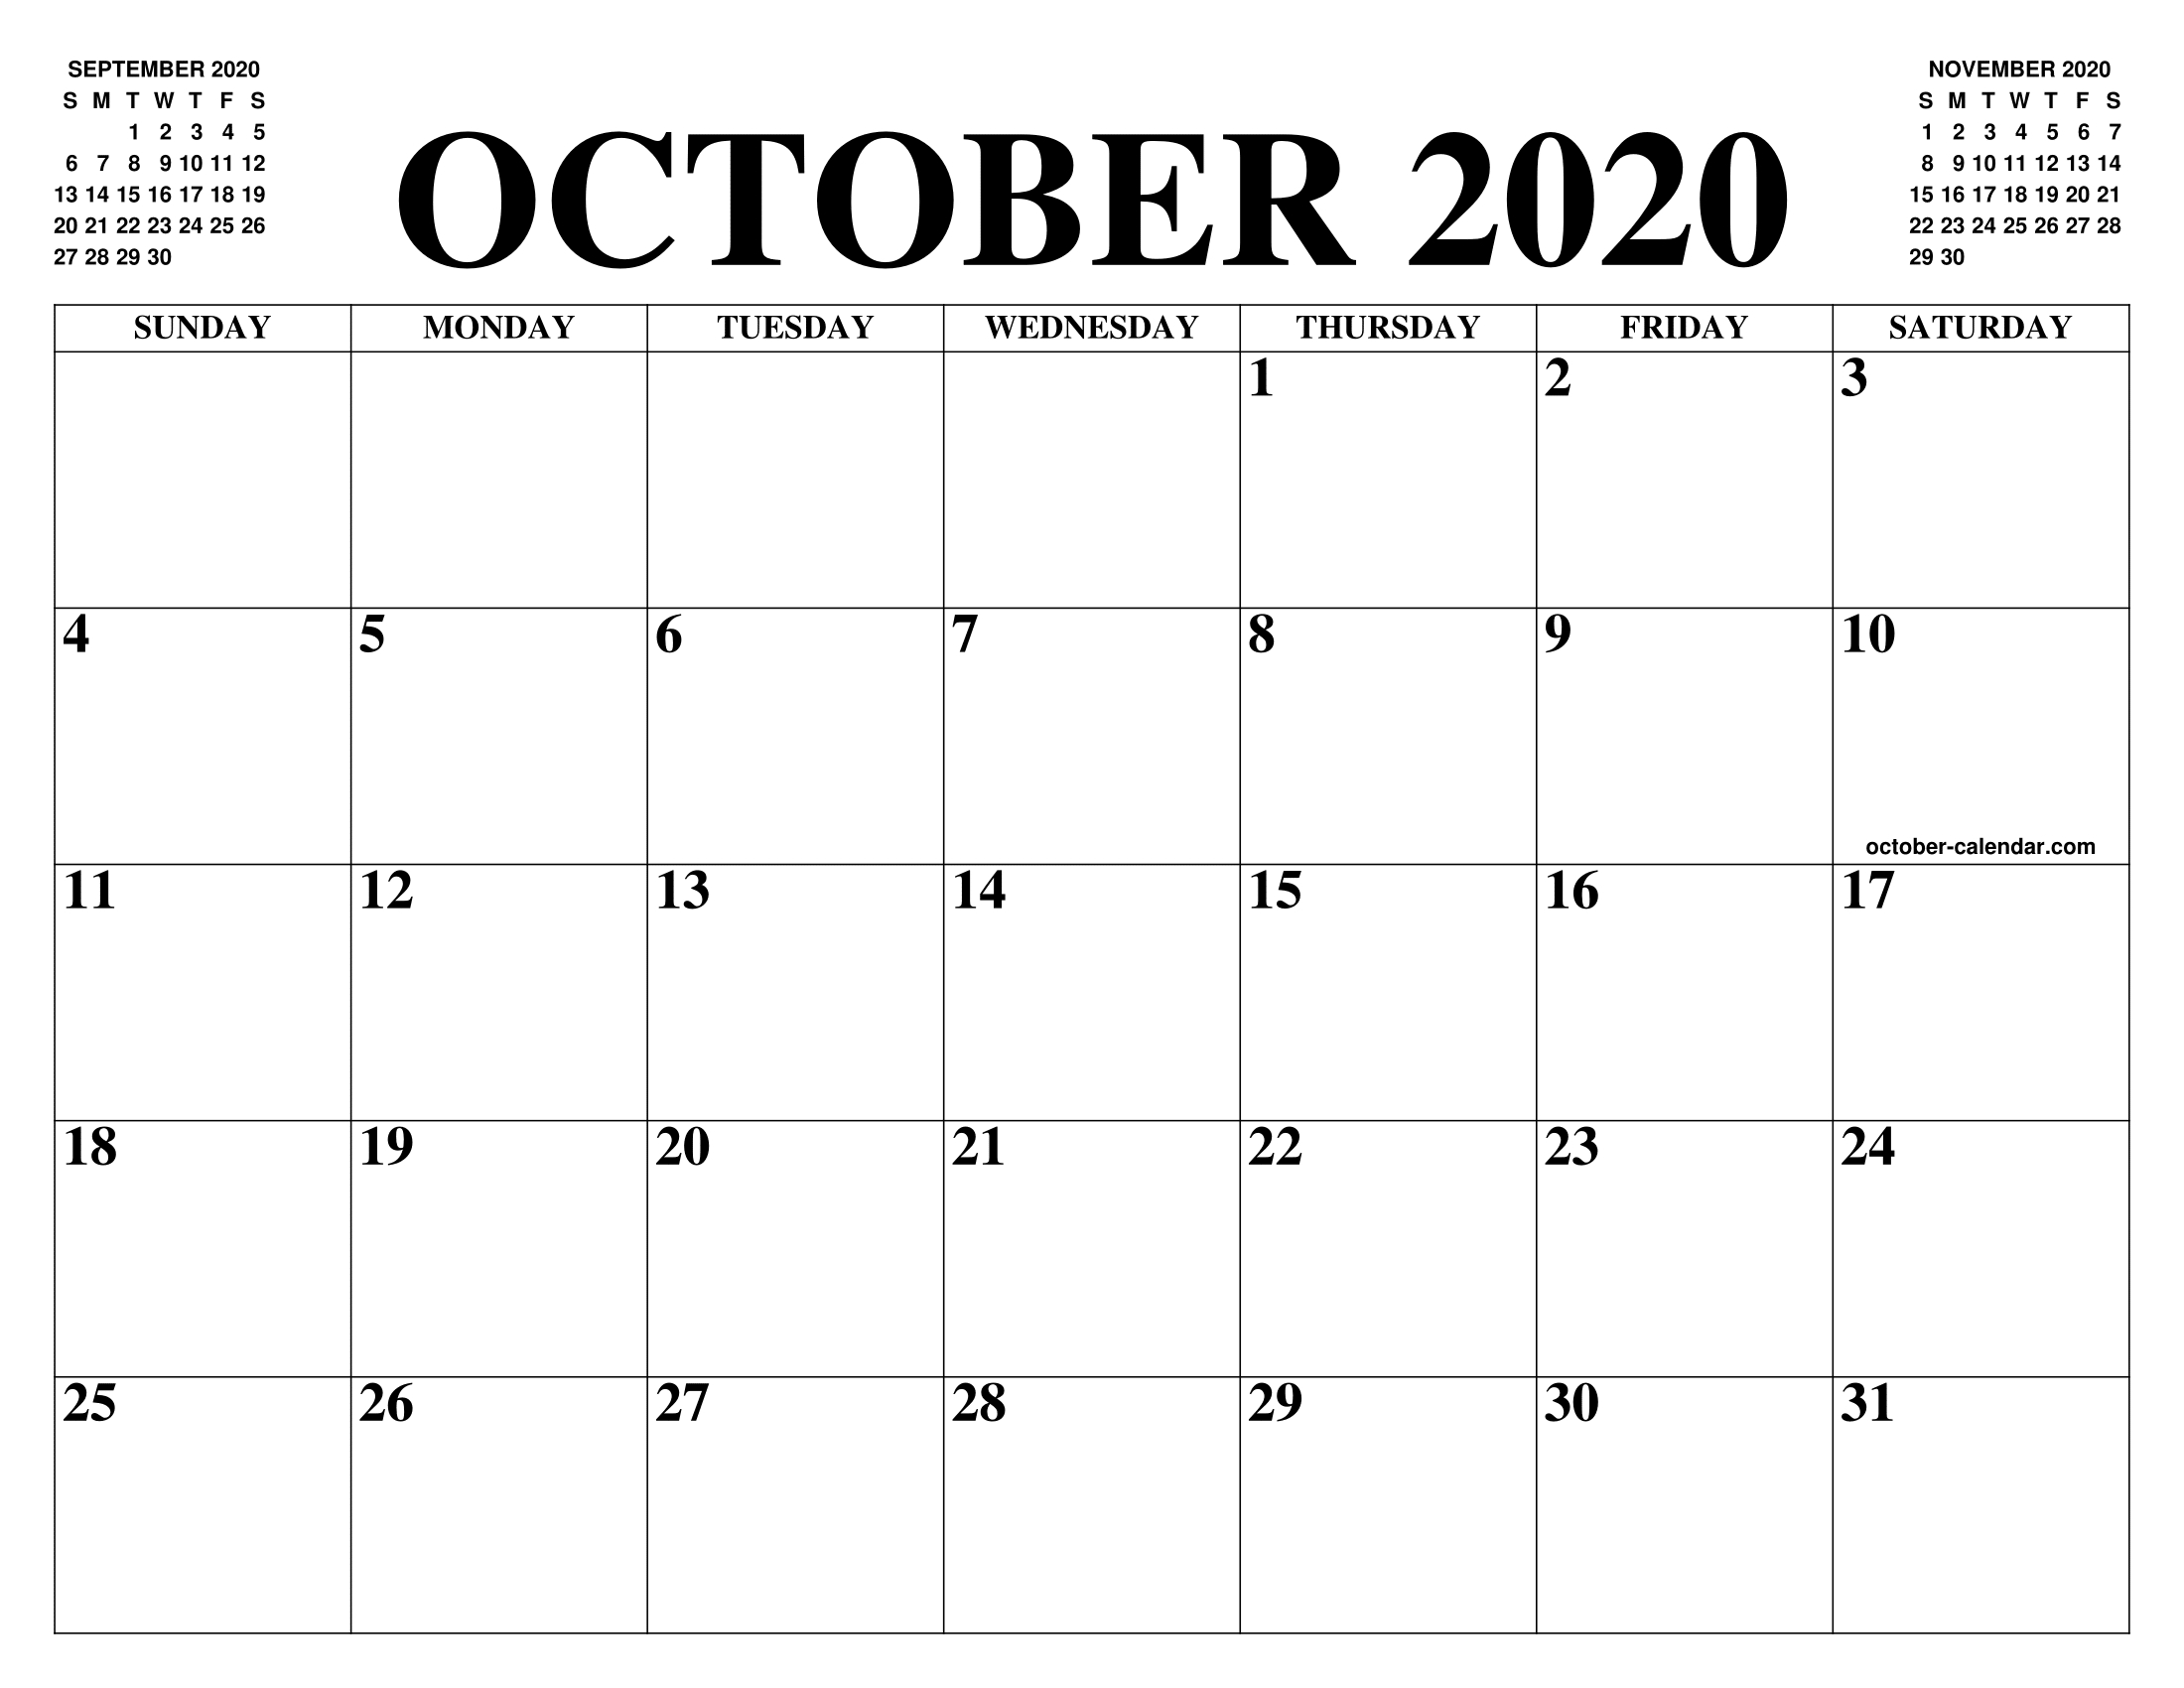 Free Blank Calendar For October 2020 Printable Fillable Template-2021 Printable Calendar From October Thru December